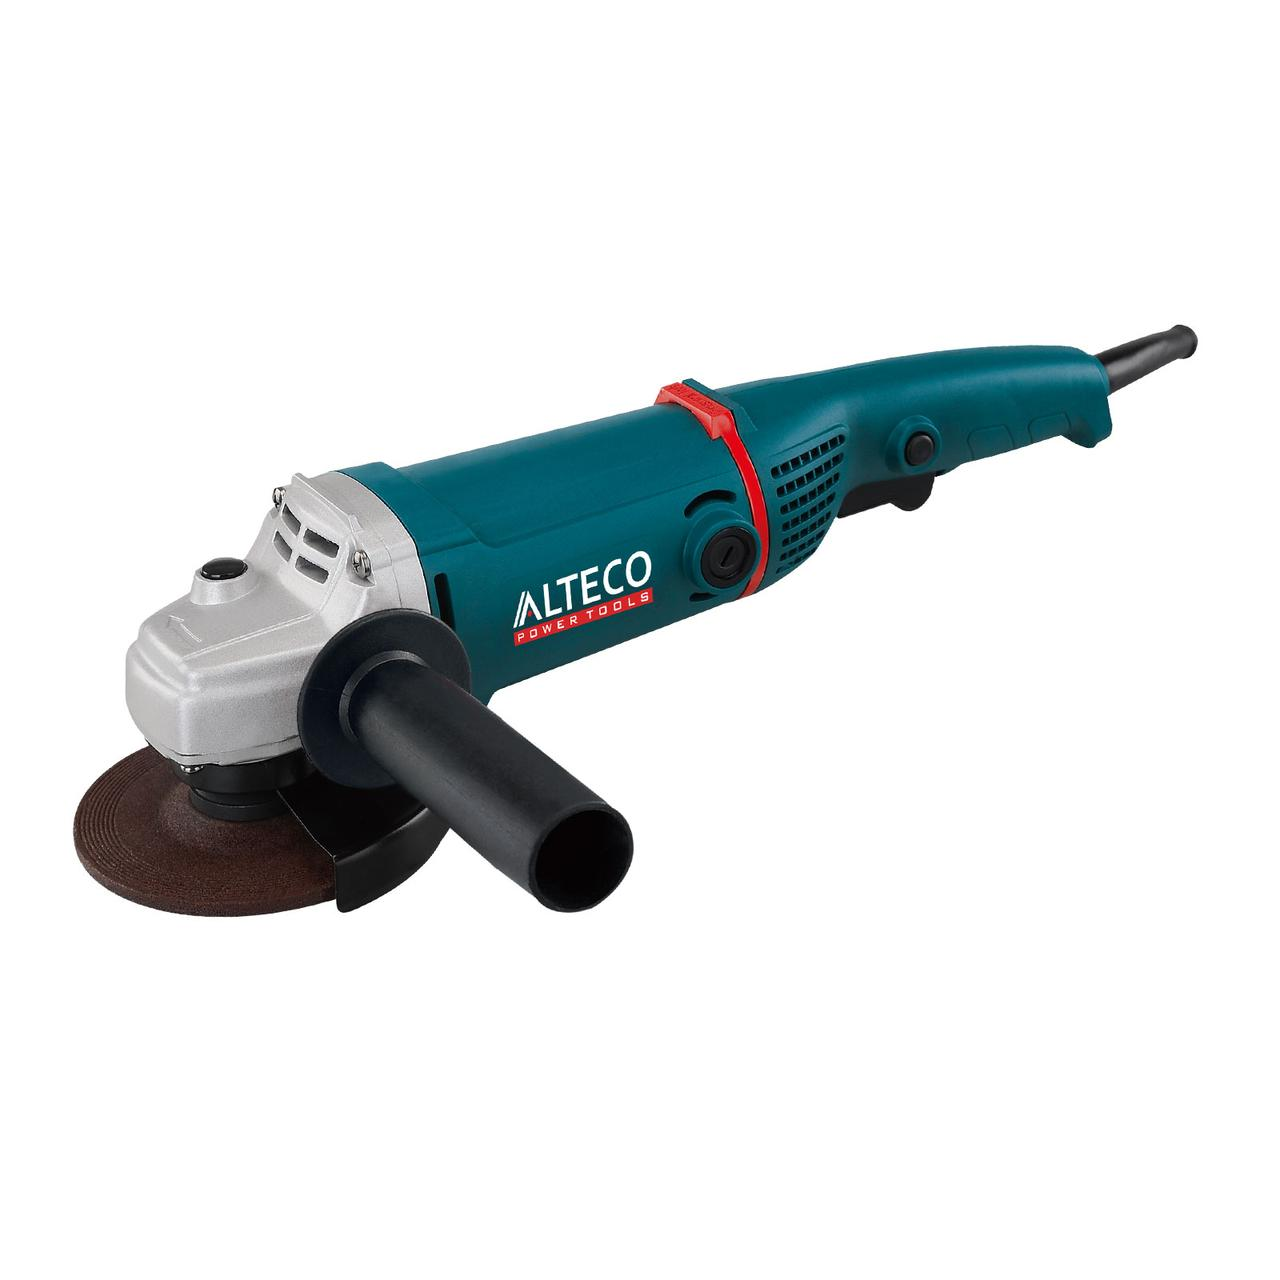 Угловая шлифмашина ALTECO AG 1300-125 1200Вт d=125мм 9000об/мин М14